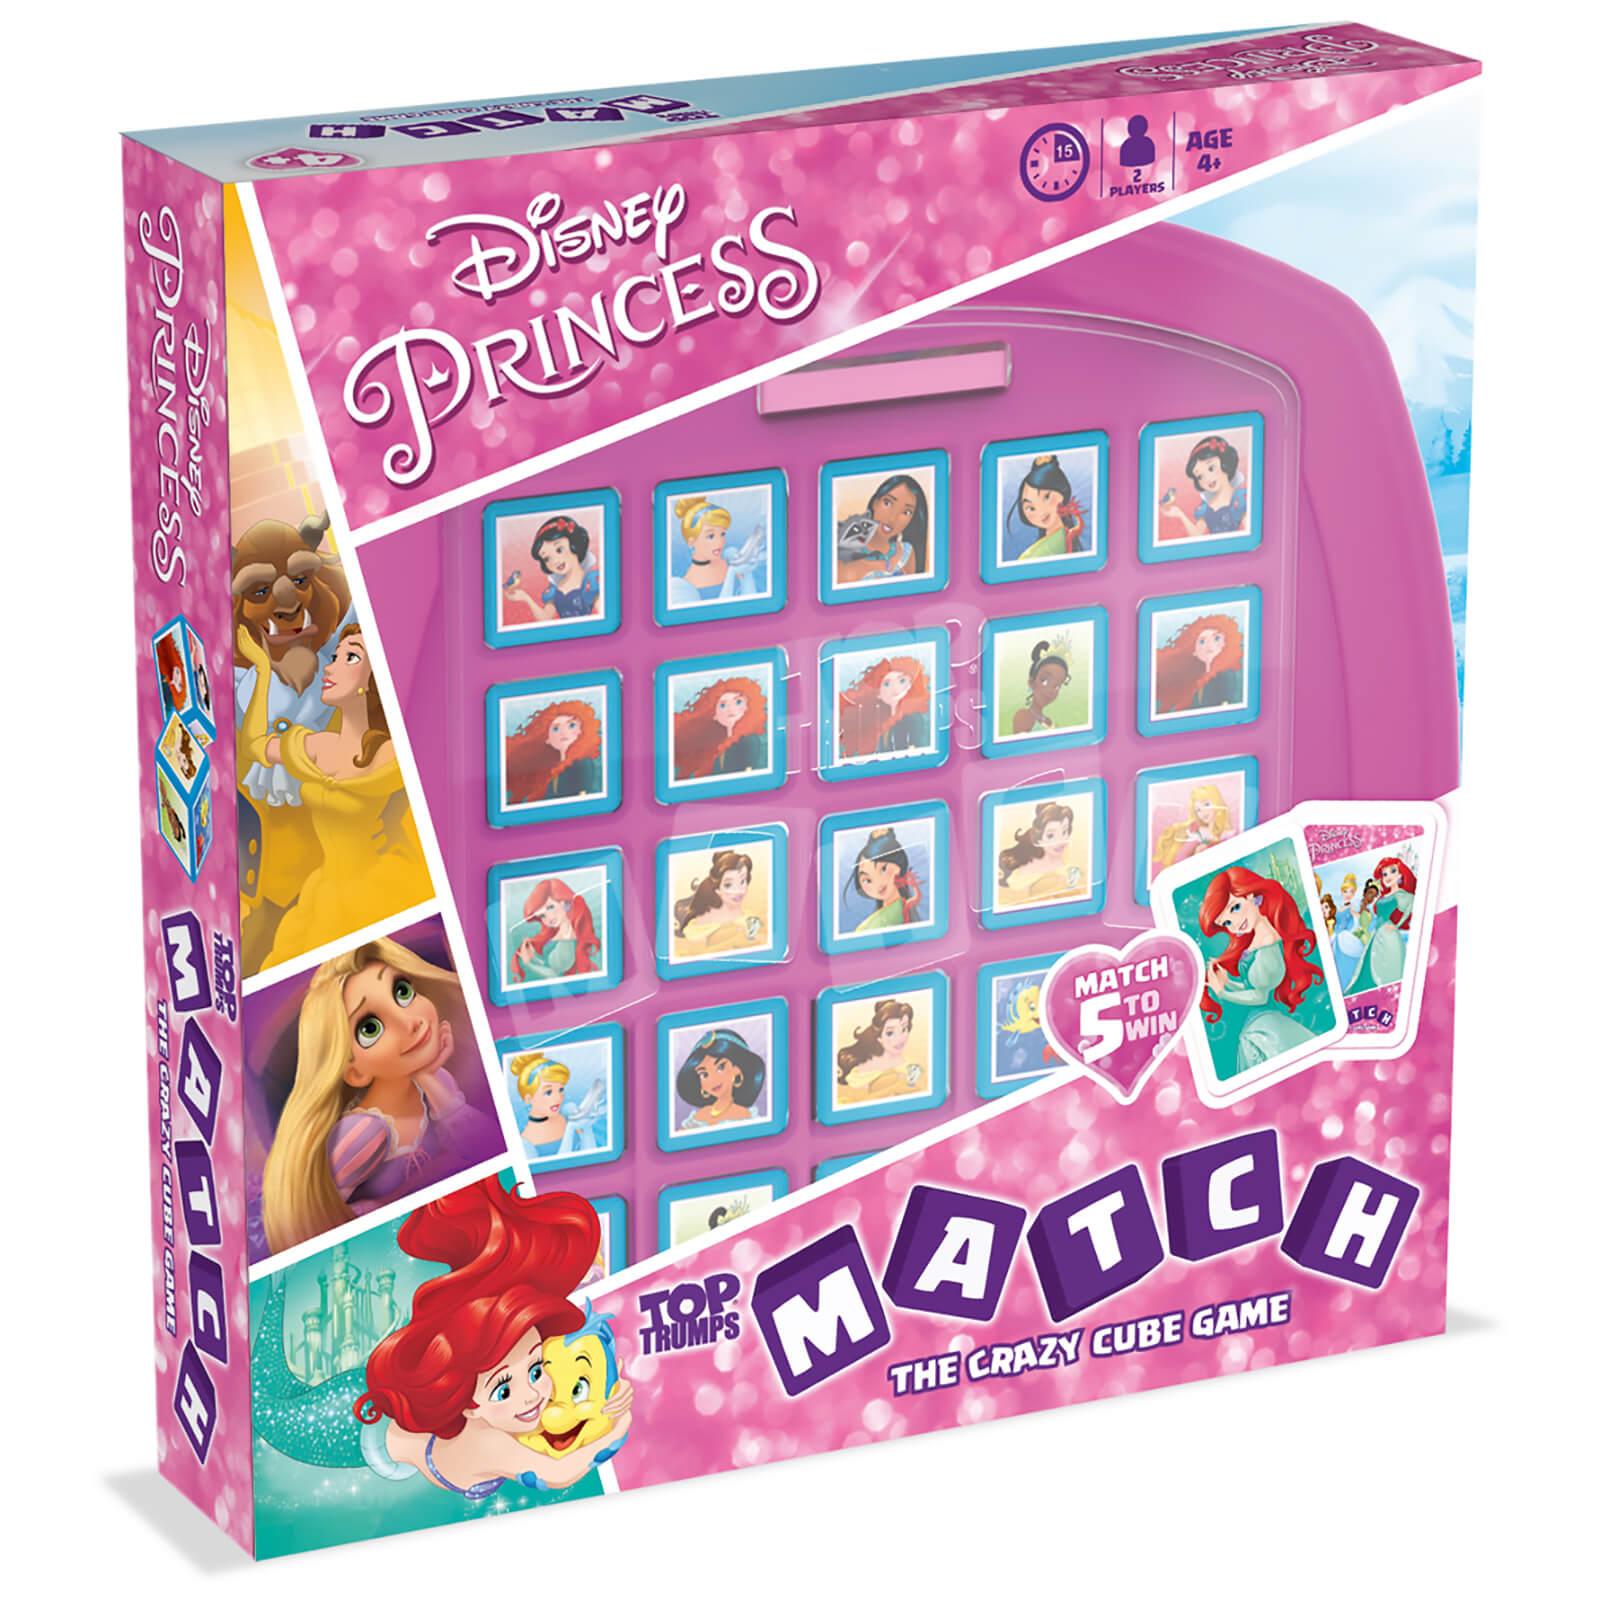 Image of Top Trumps Match Board Game - Disney Princess Edition